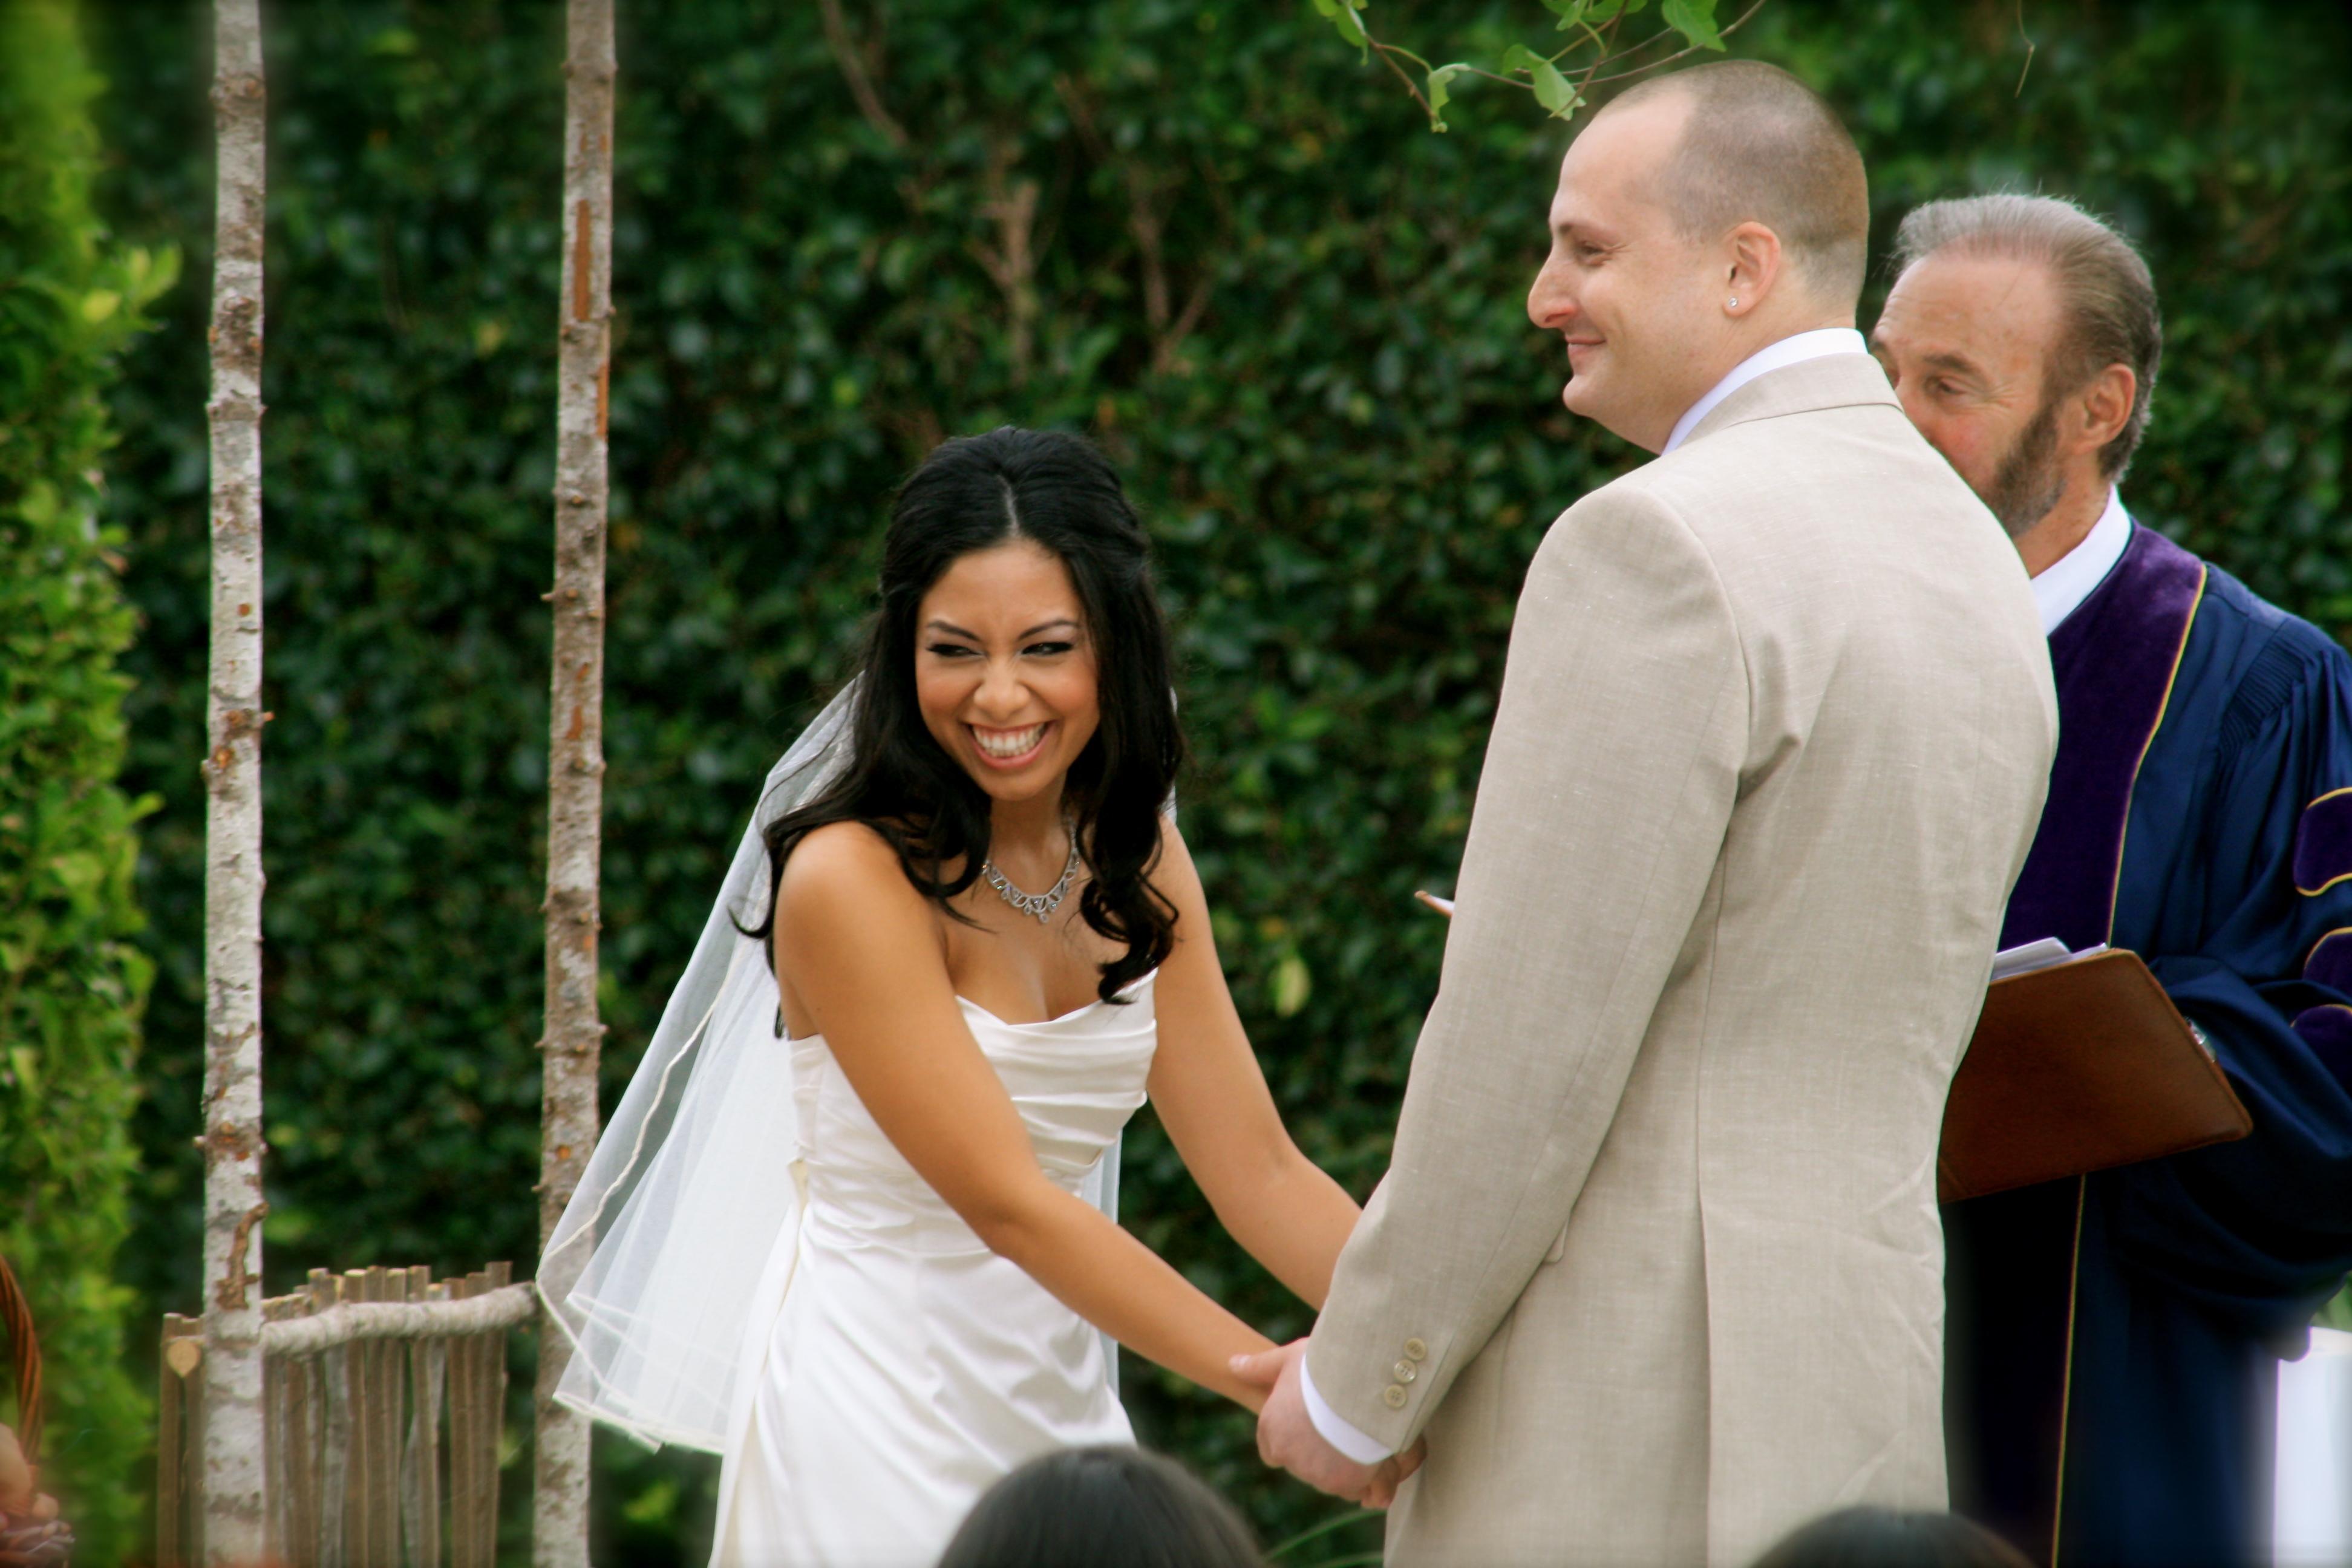 Ceremony, Flowers & Decor, pink, Hands, Ca, Malibu, Manor, Stone, Holding